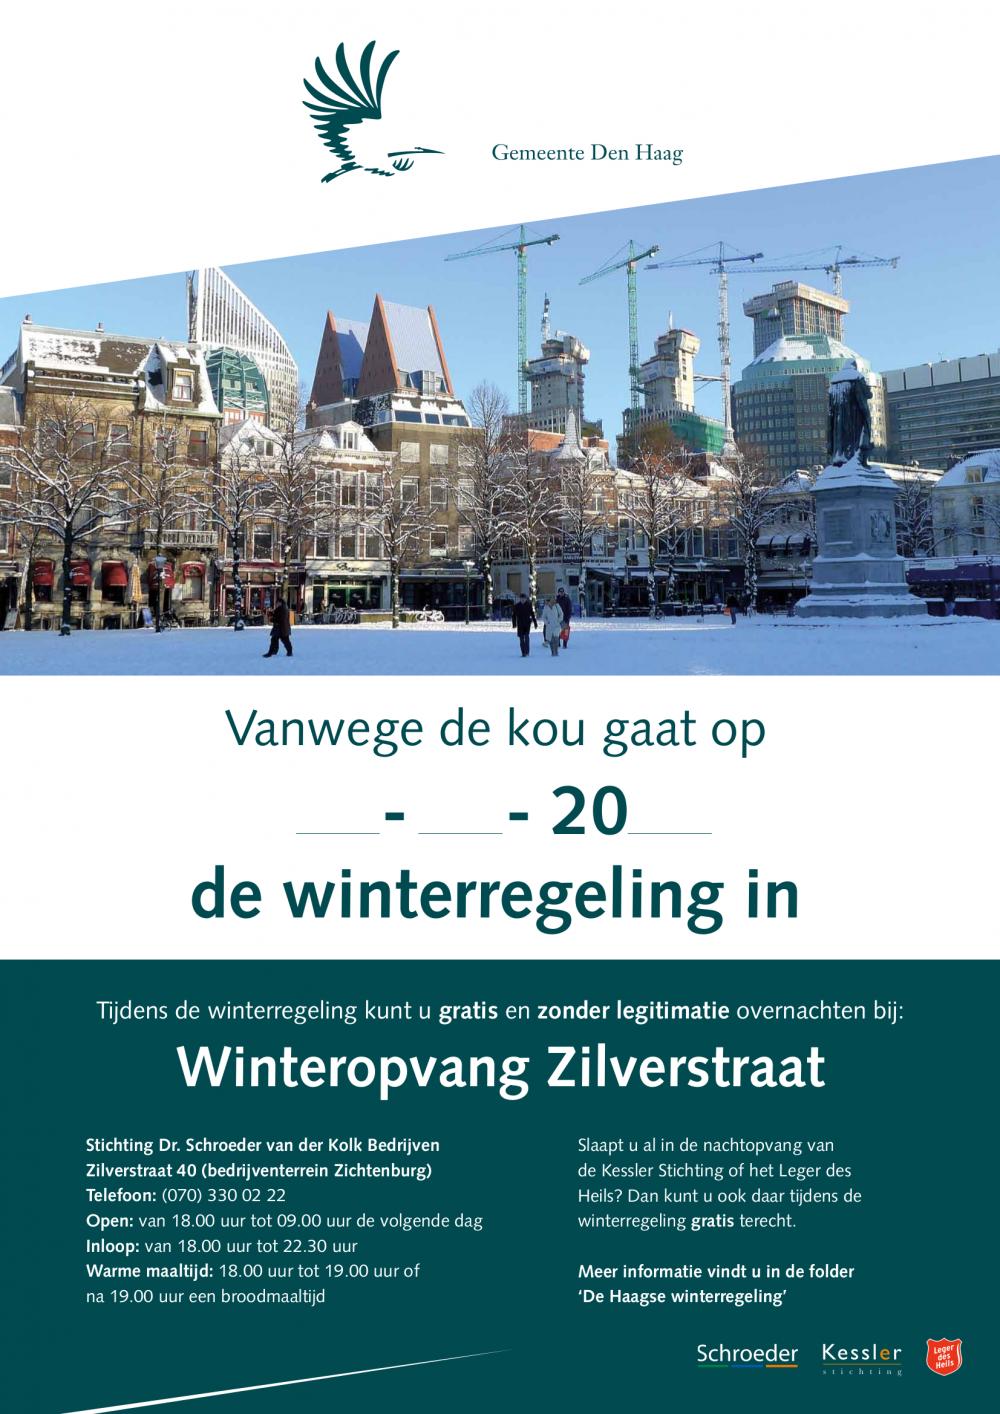 Winterregeling daklozen in Den Haag